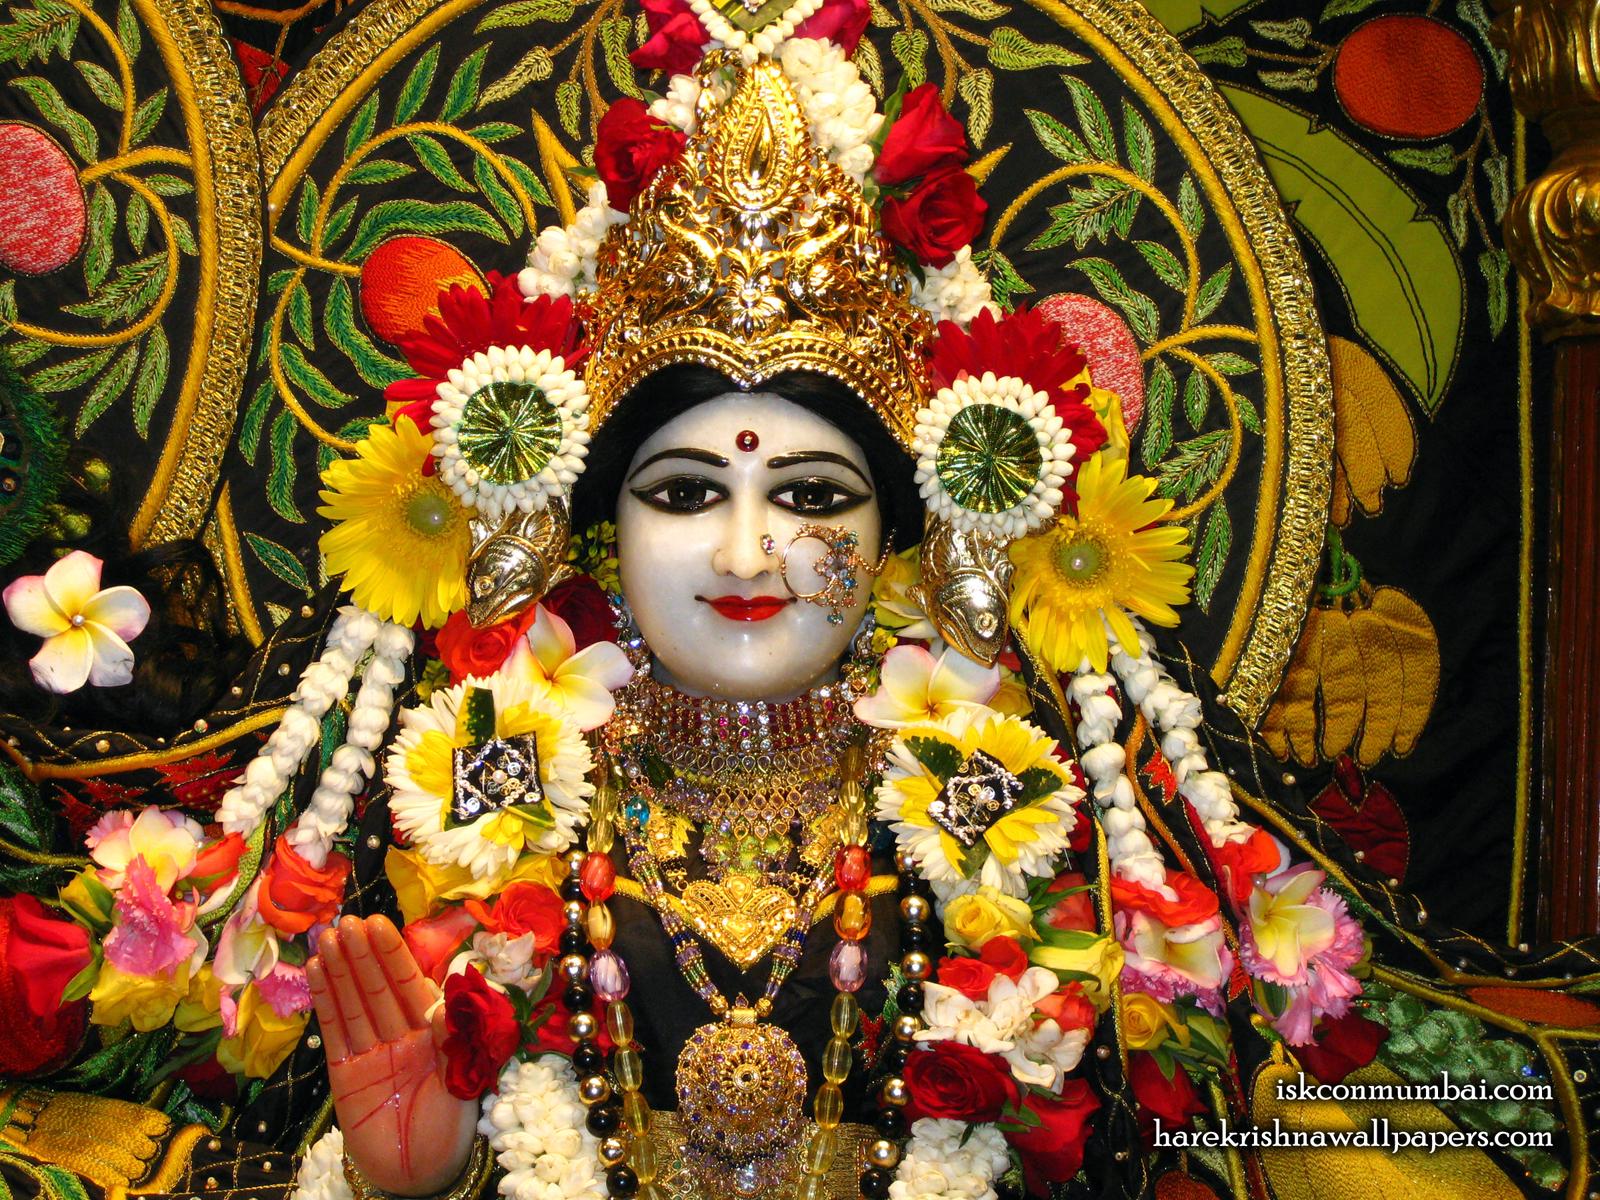 Sri Radha Face Wallpaper (008) Size1600x1200 Download